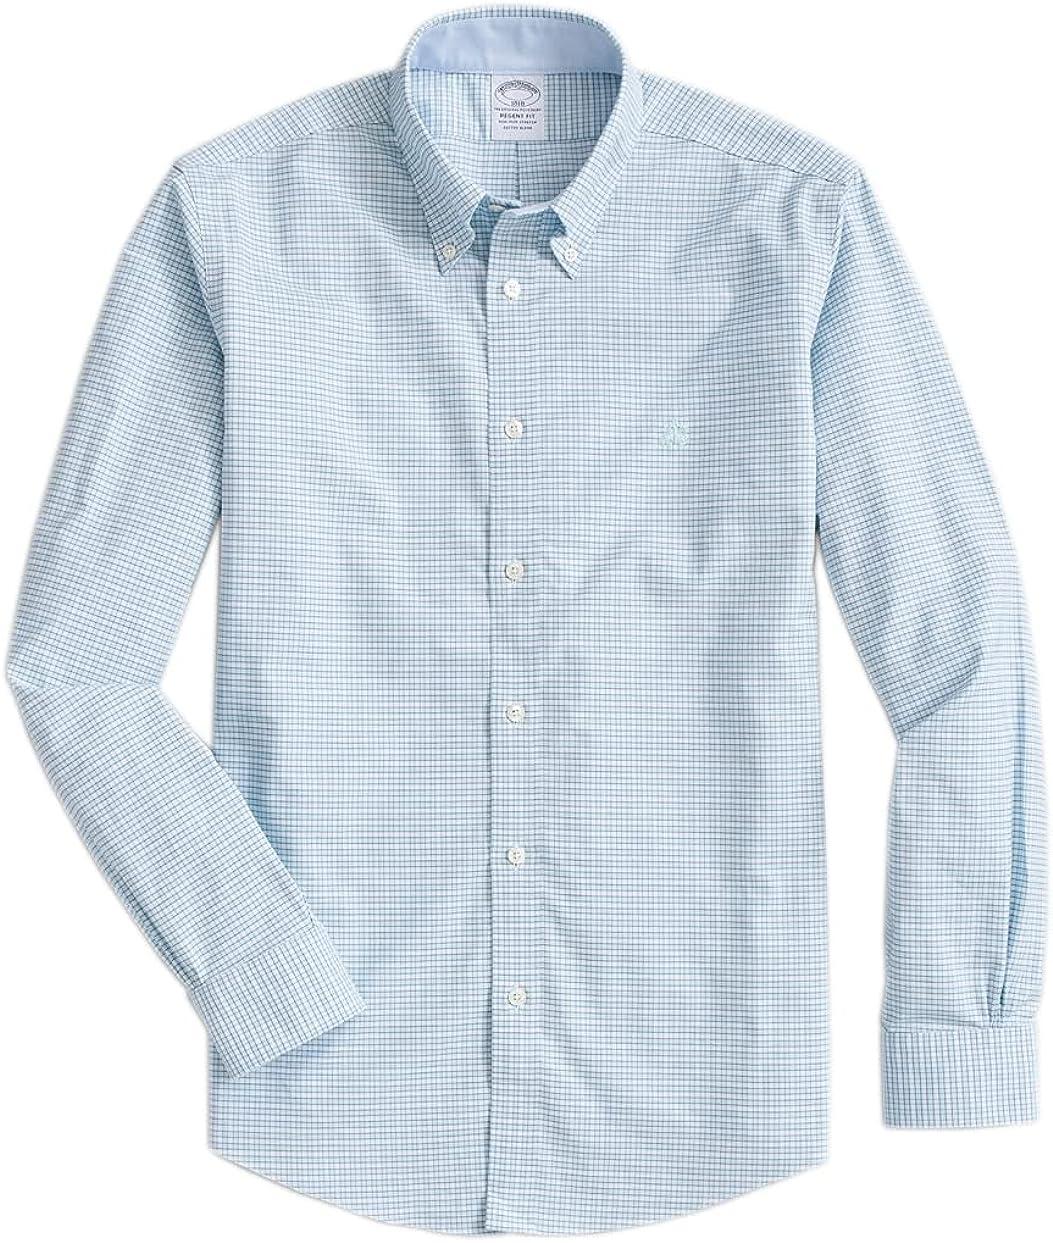 Brooks Brothers Men's Regent Fit The Original Polo Non Iron Oxford Shirt Mini Gingham Plaid